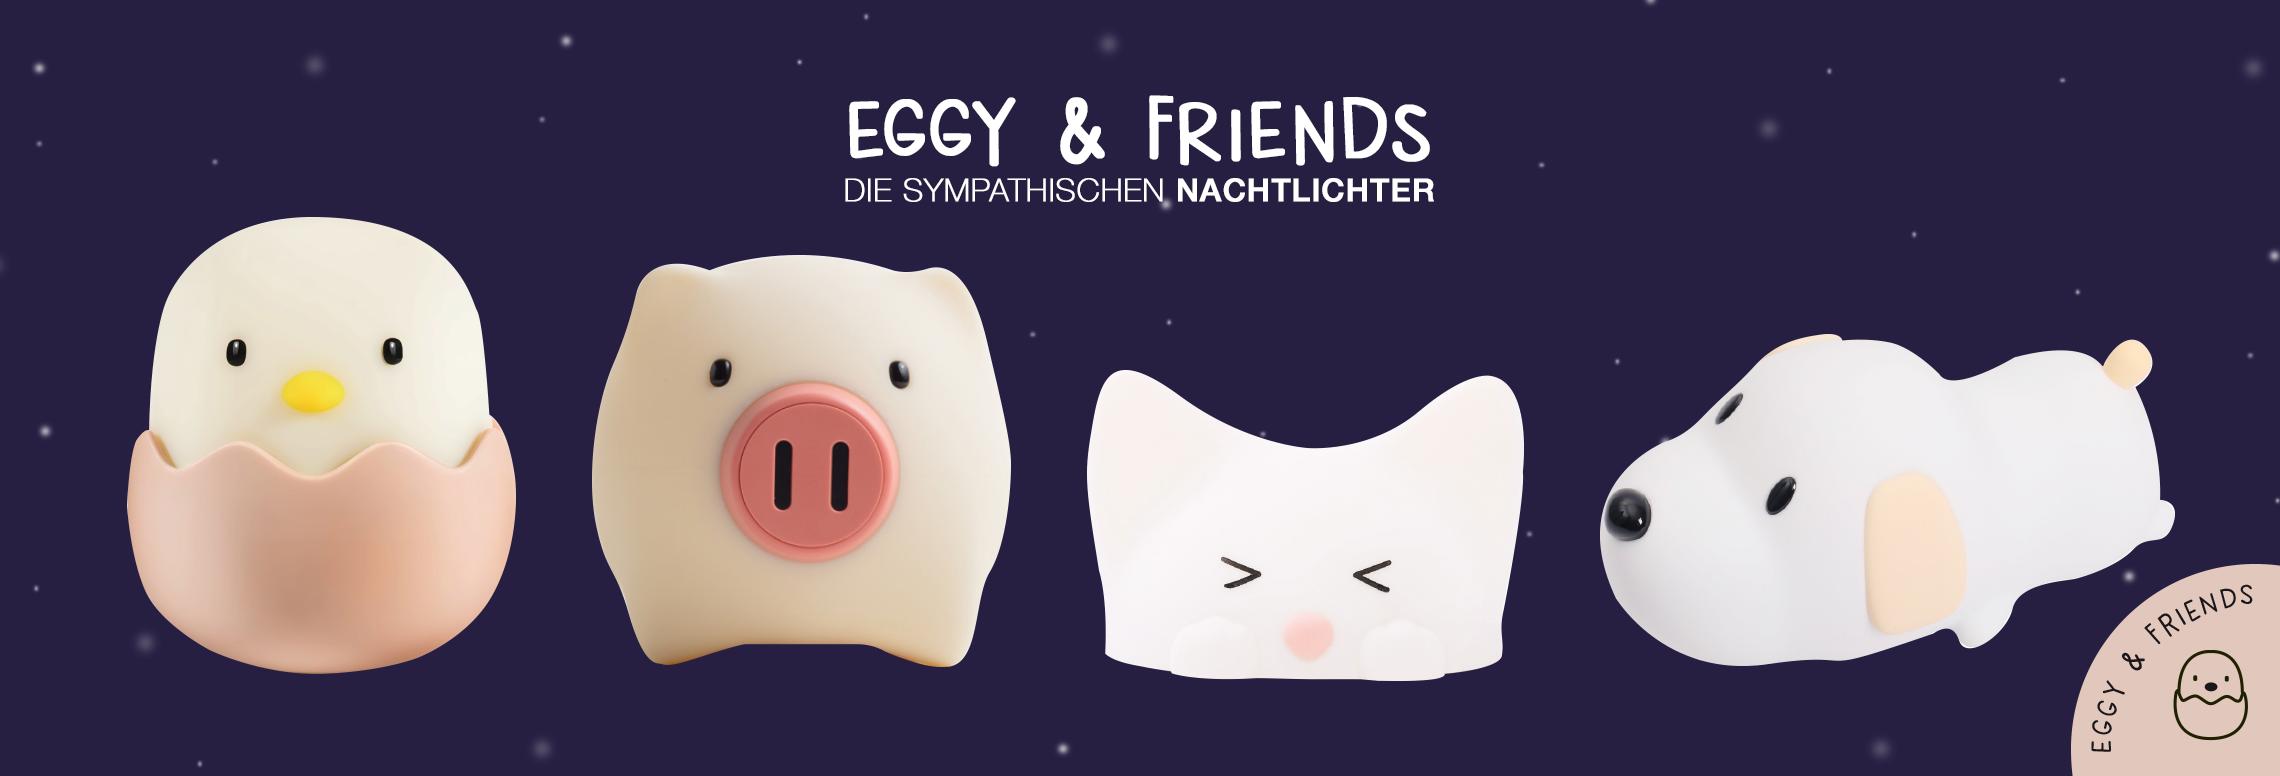 Eggy&Friends Kindernachtlichter